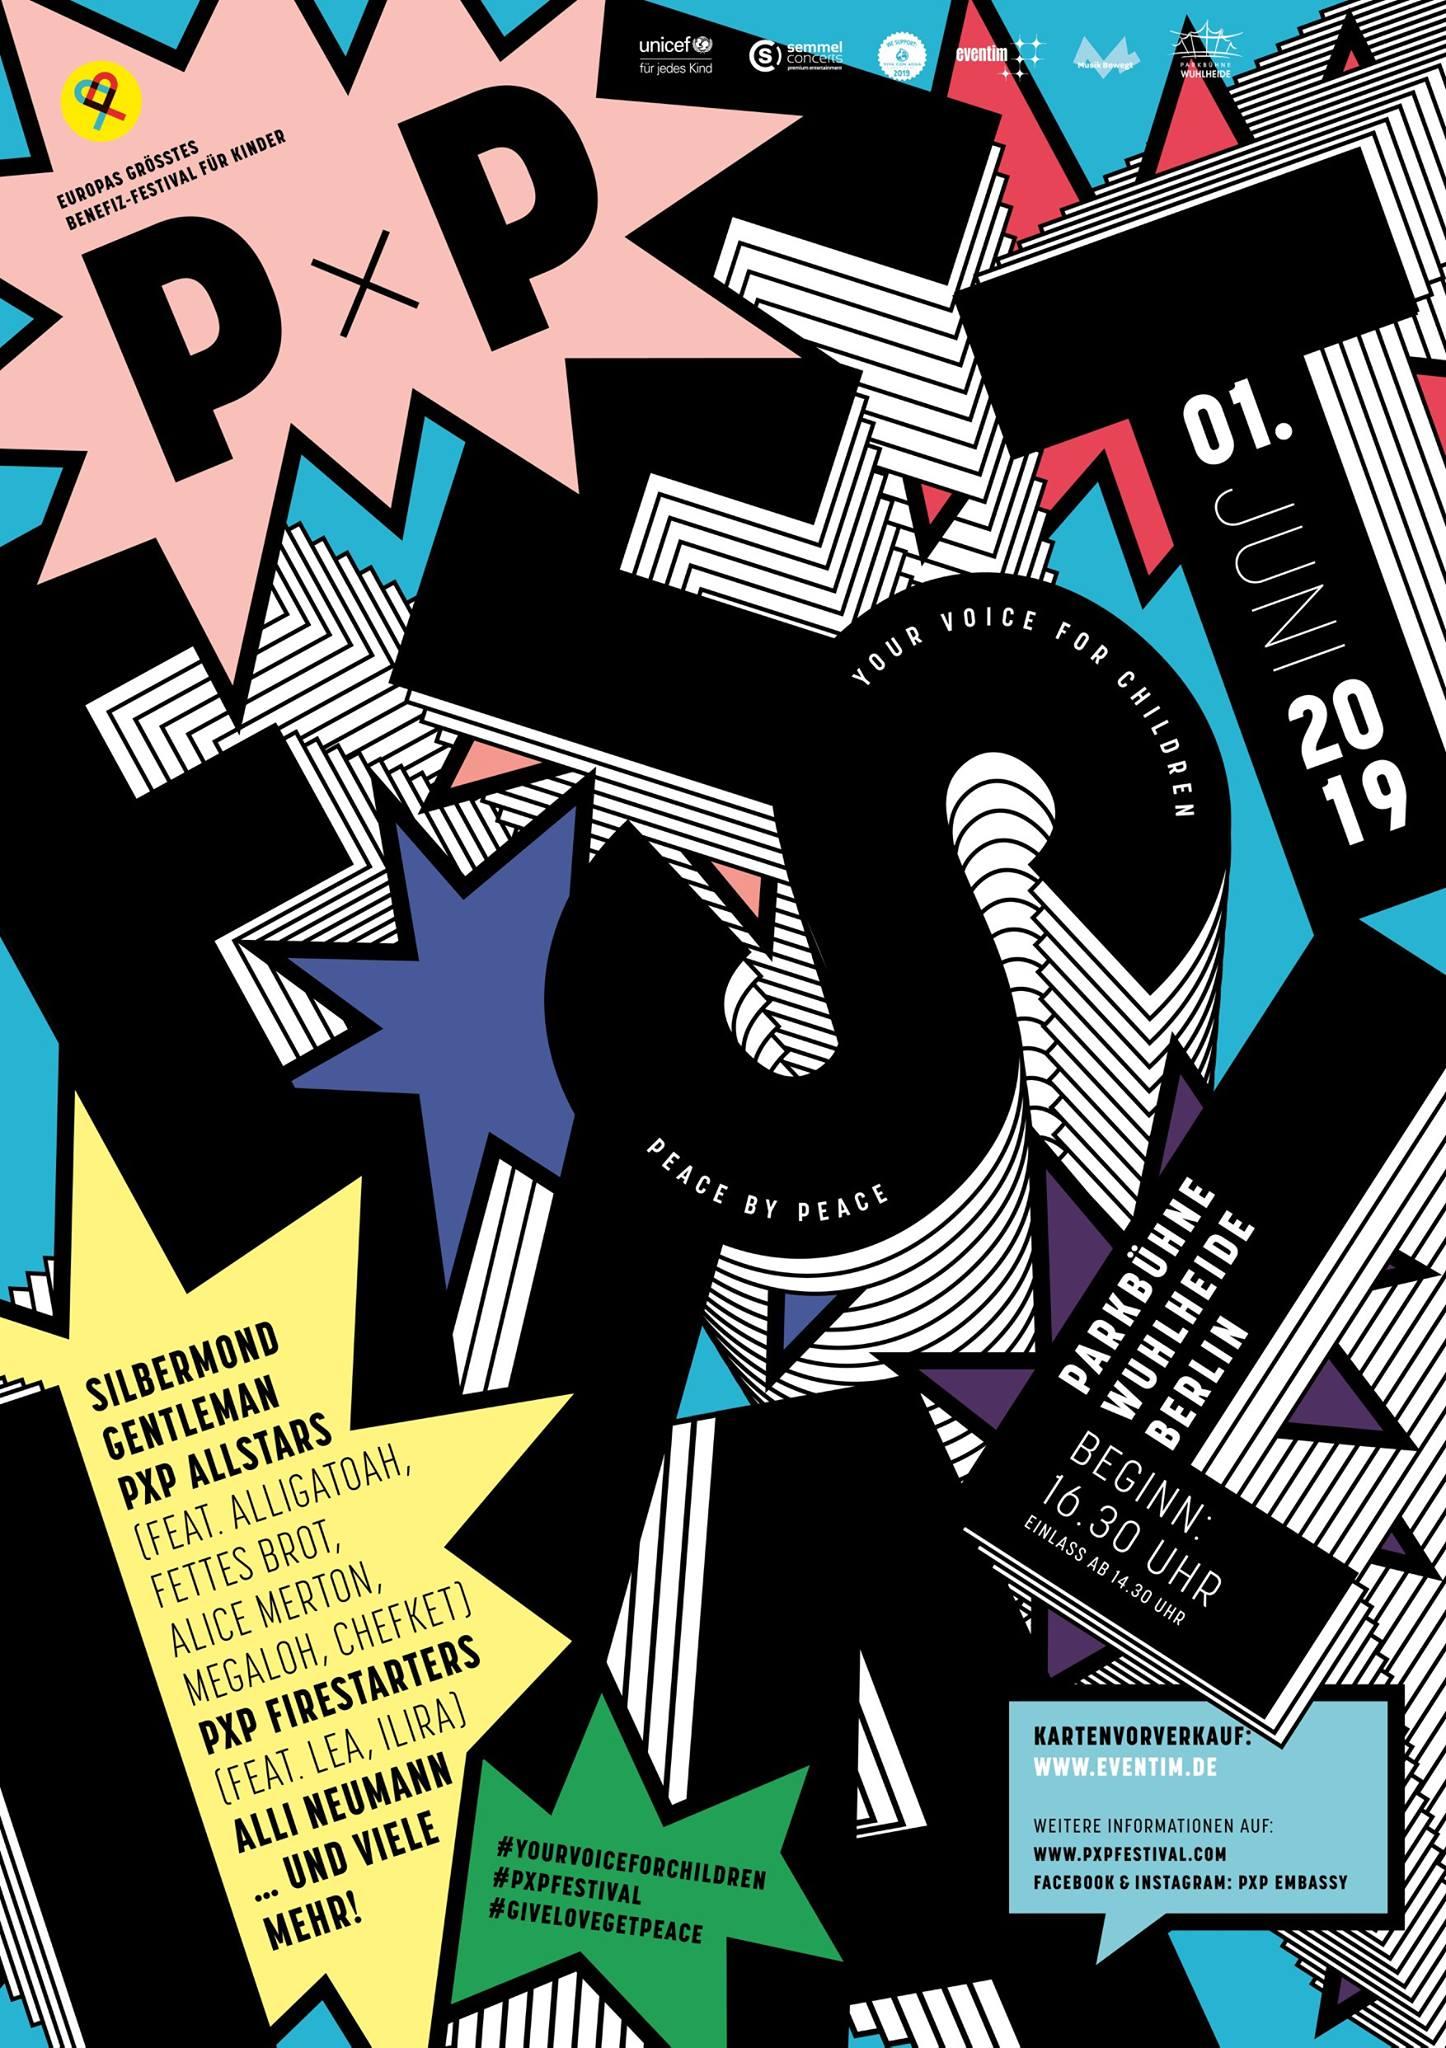 PxP Festival Tickets on Sale Now! – PxP Embassy e V